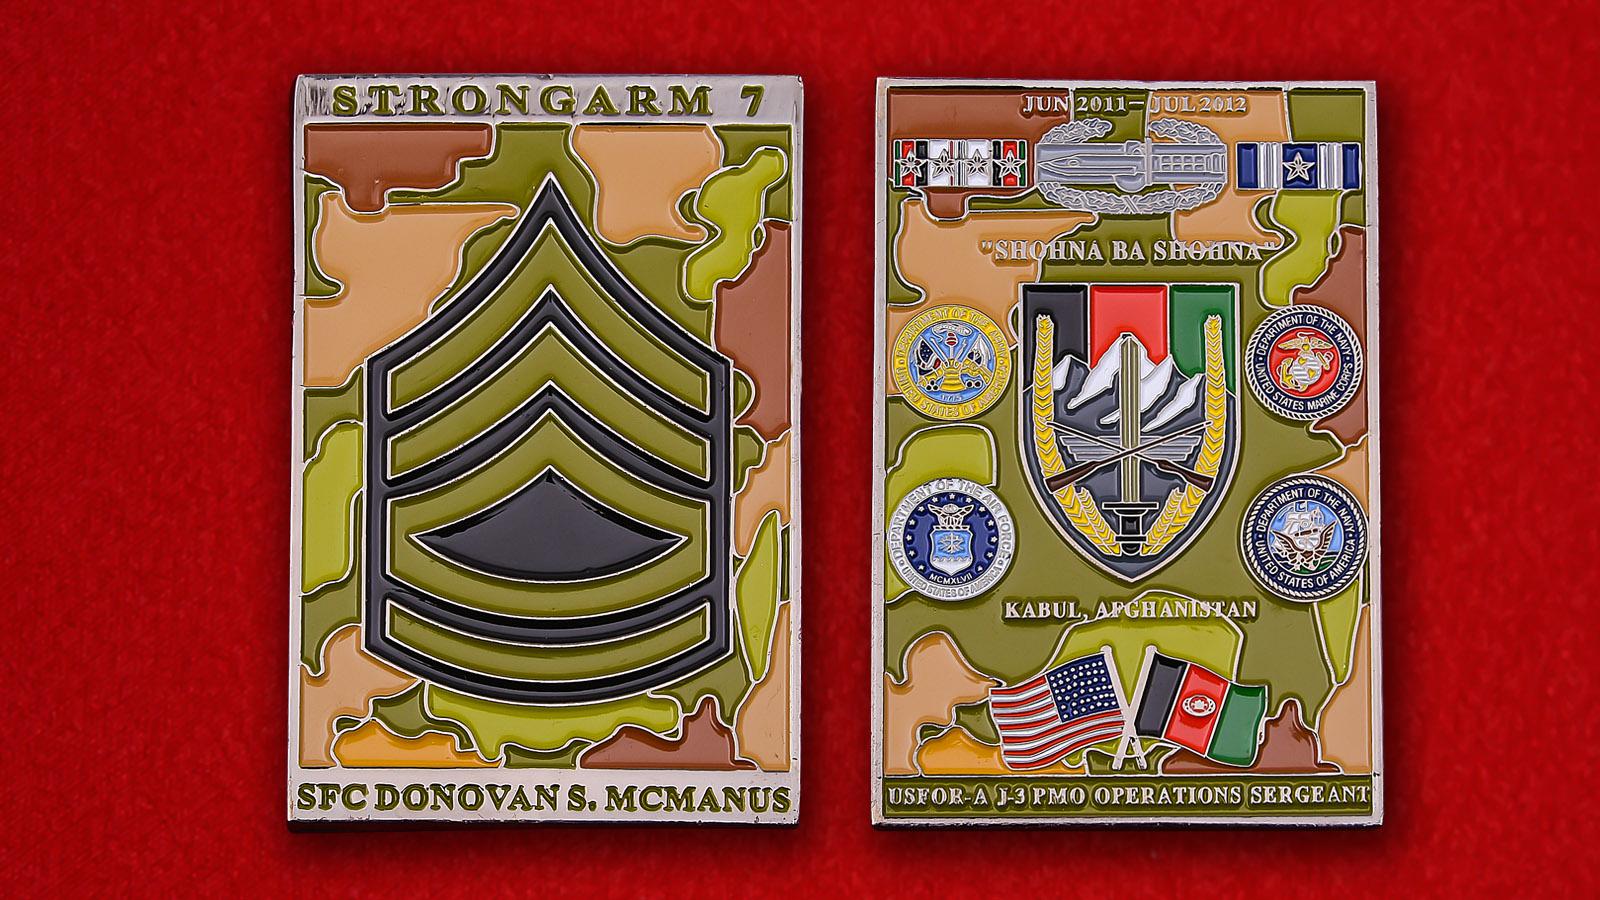 SFC Donovan S. Macmanus USFOR-A Kabul, Afghanistan Challenge coin